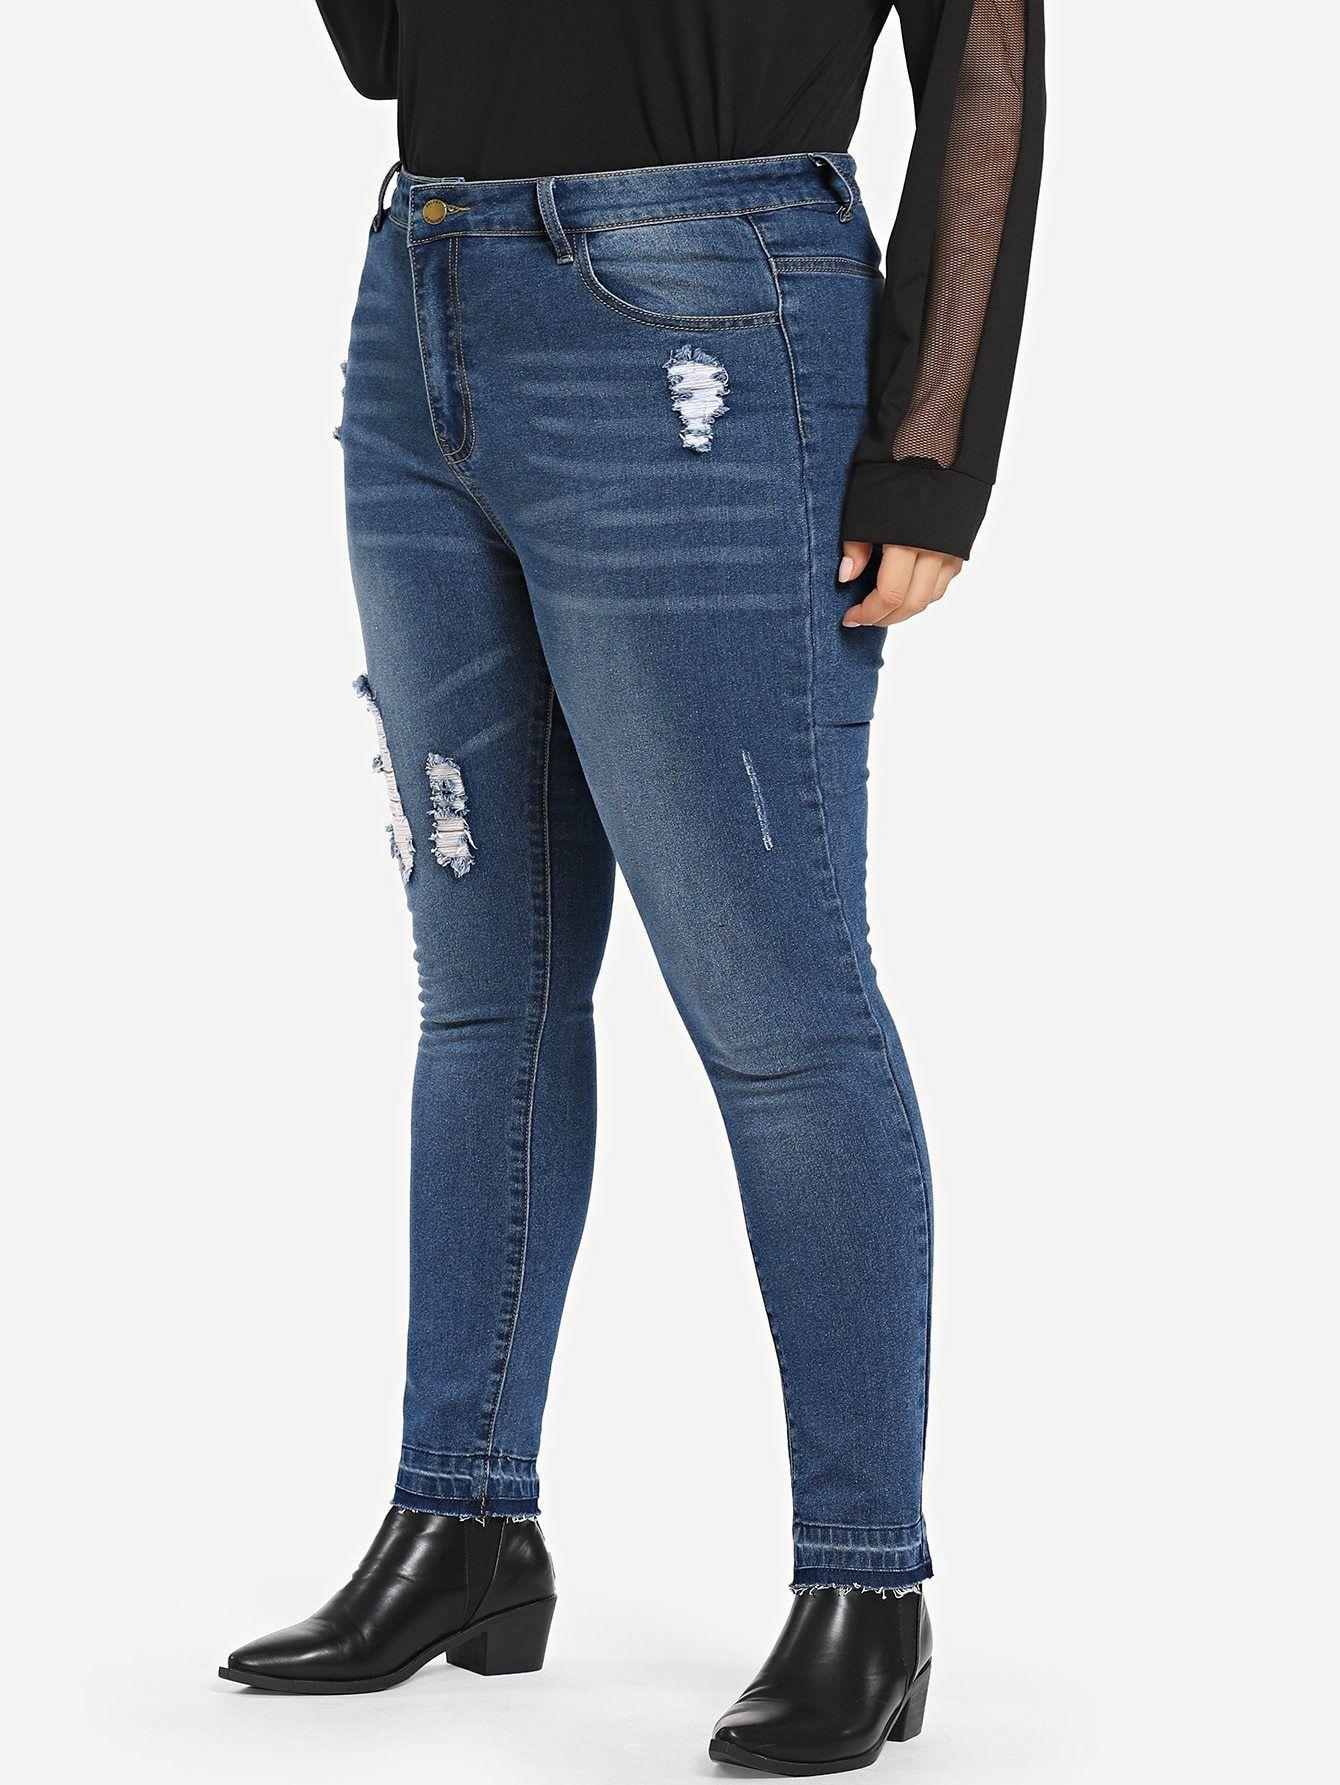 e4404f51e4 Jeans bajo crudo rotos-grande www.muybonita.co - Colombia  muybonitaco